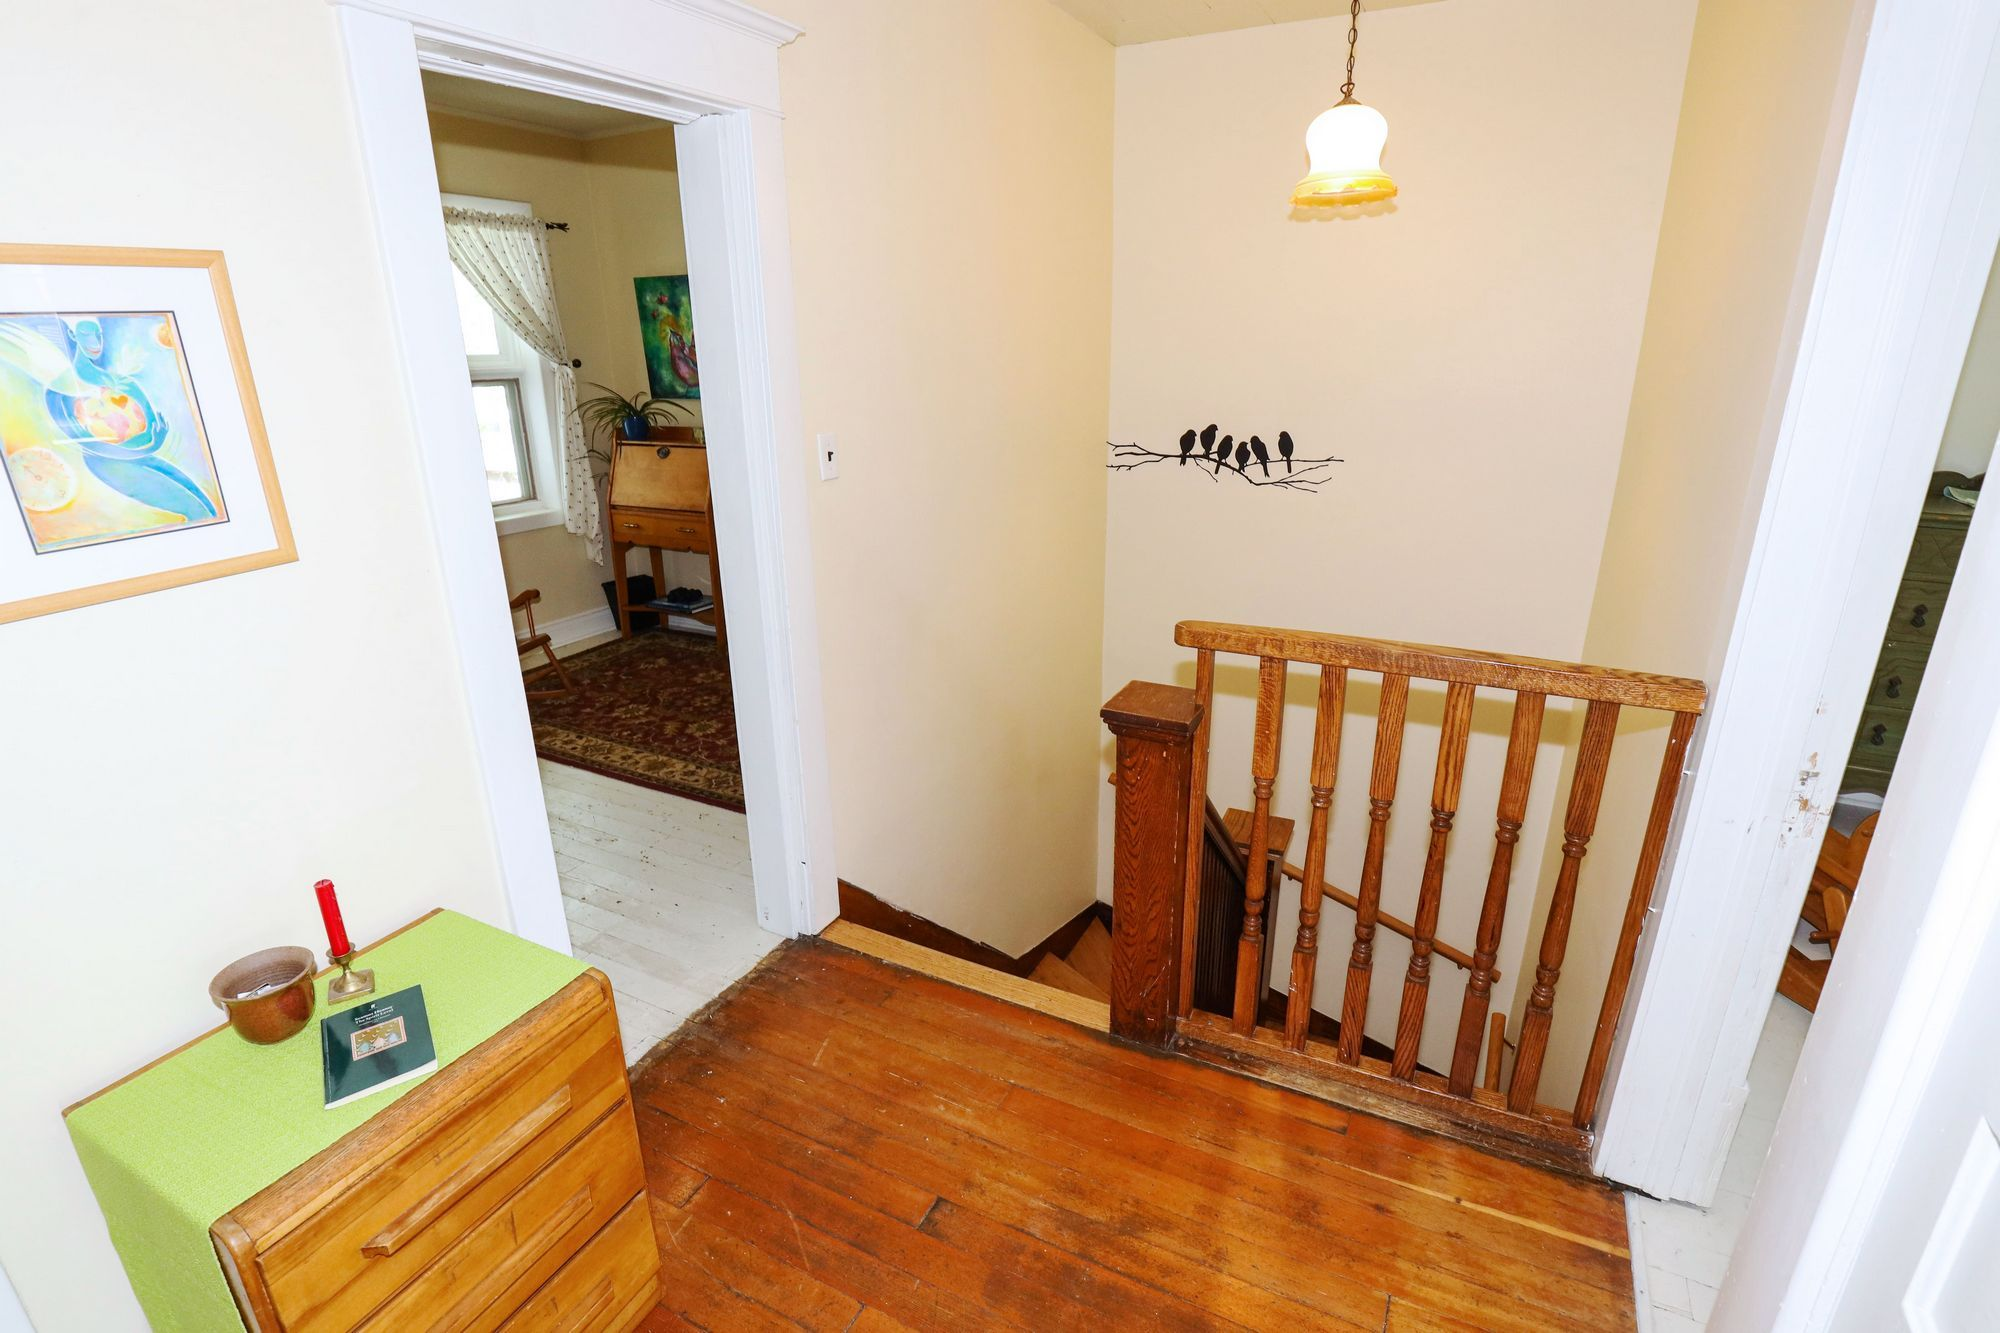 Photo 19: Photos: 110 Lipton in Winnipeg: Wolseley Single Family Detached for sale (5B)  : MLS®# 202111593